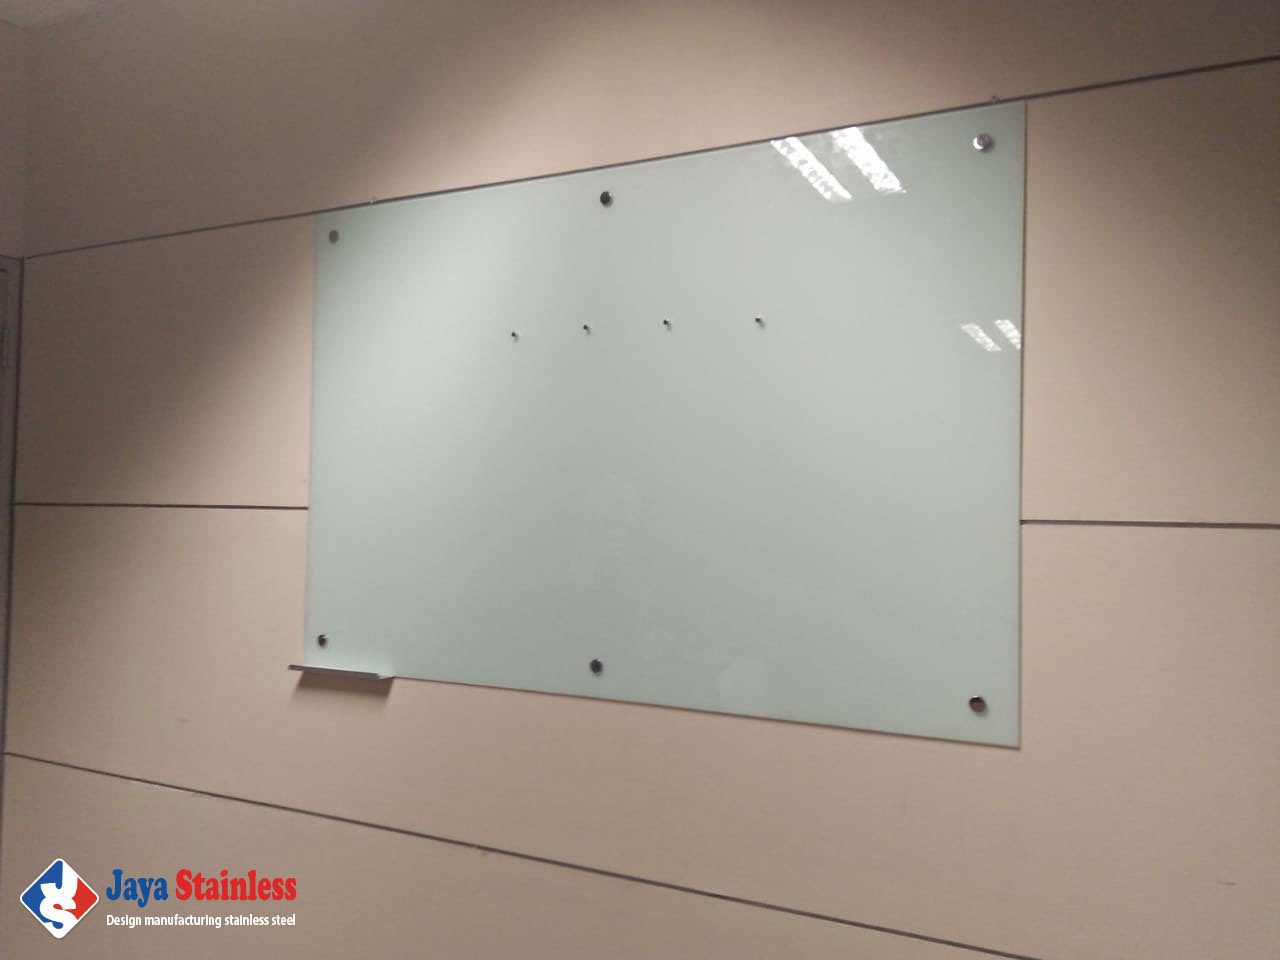 Glass Board (Papan Tulis Kaca) & Mobile Glassboard